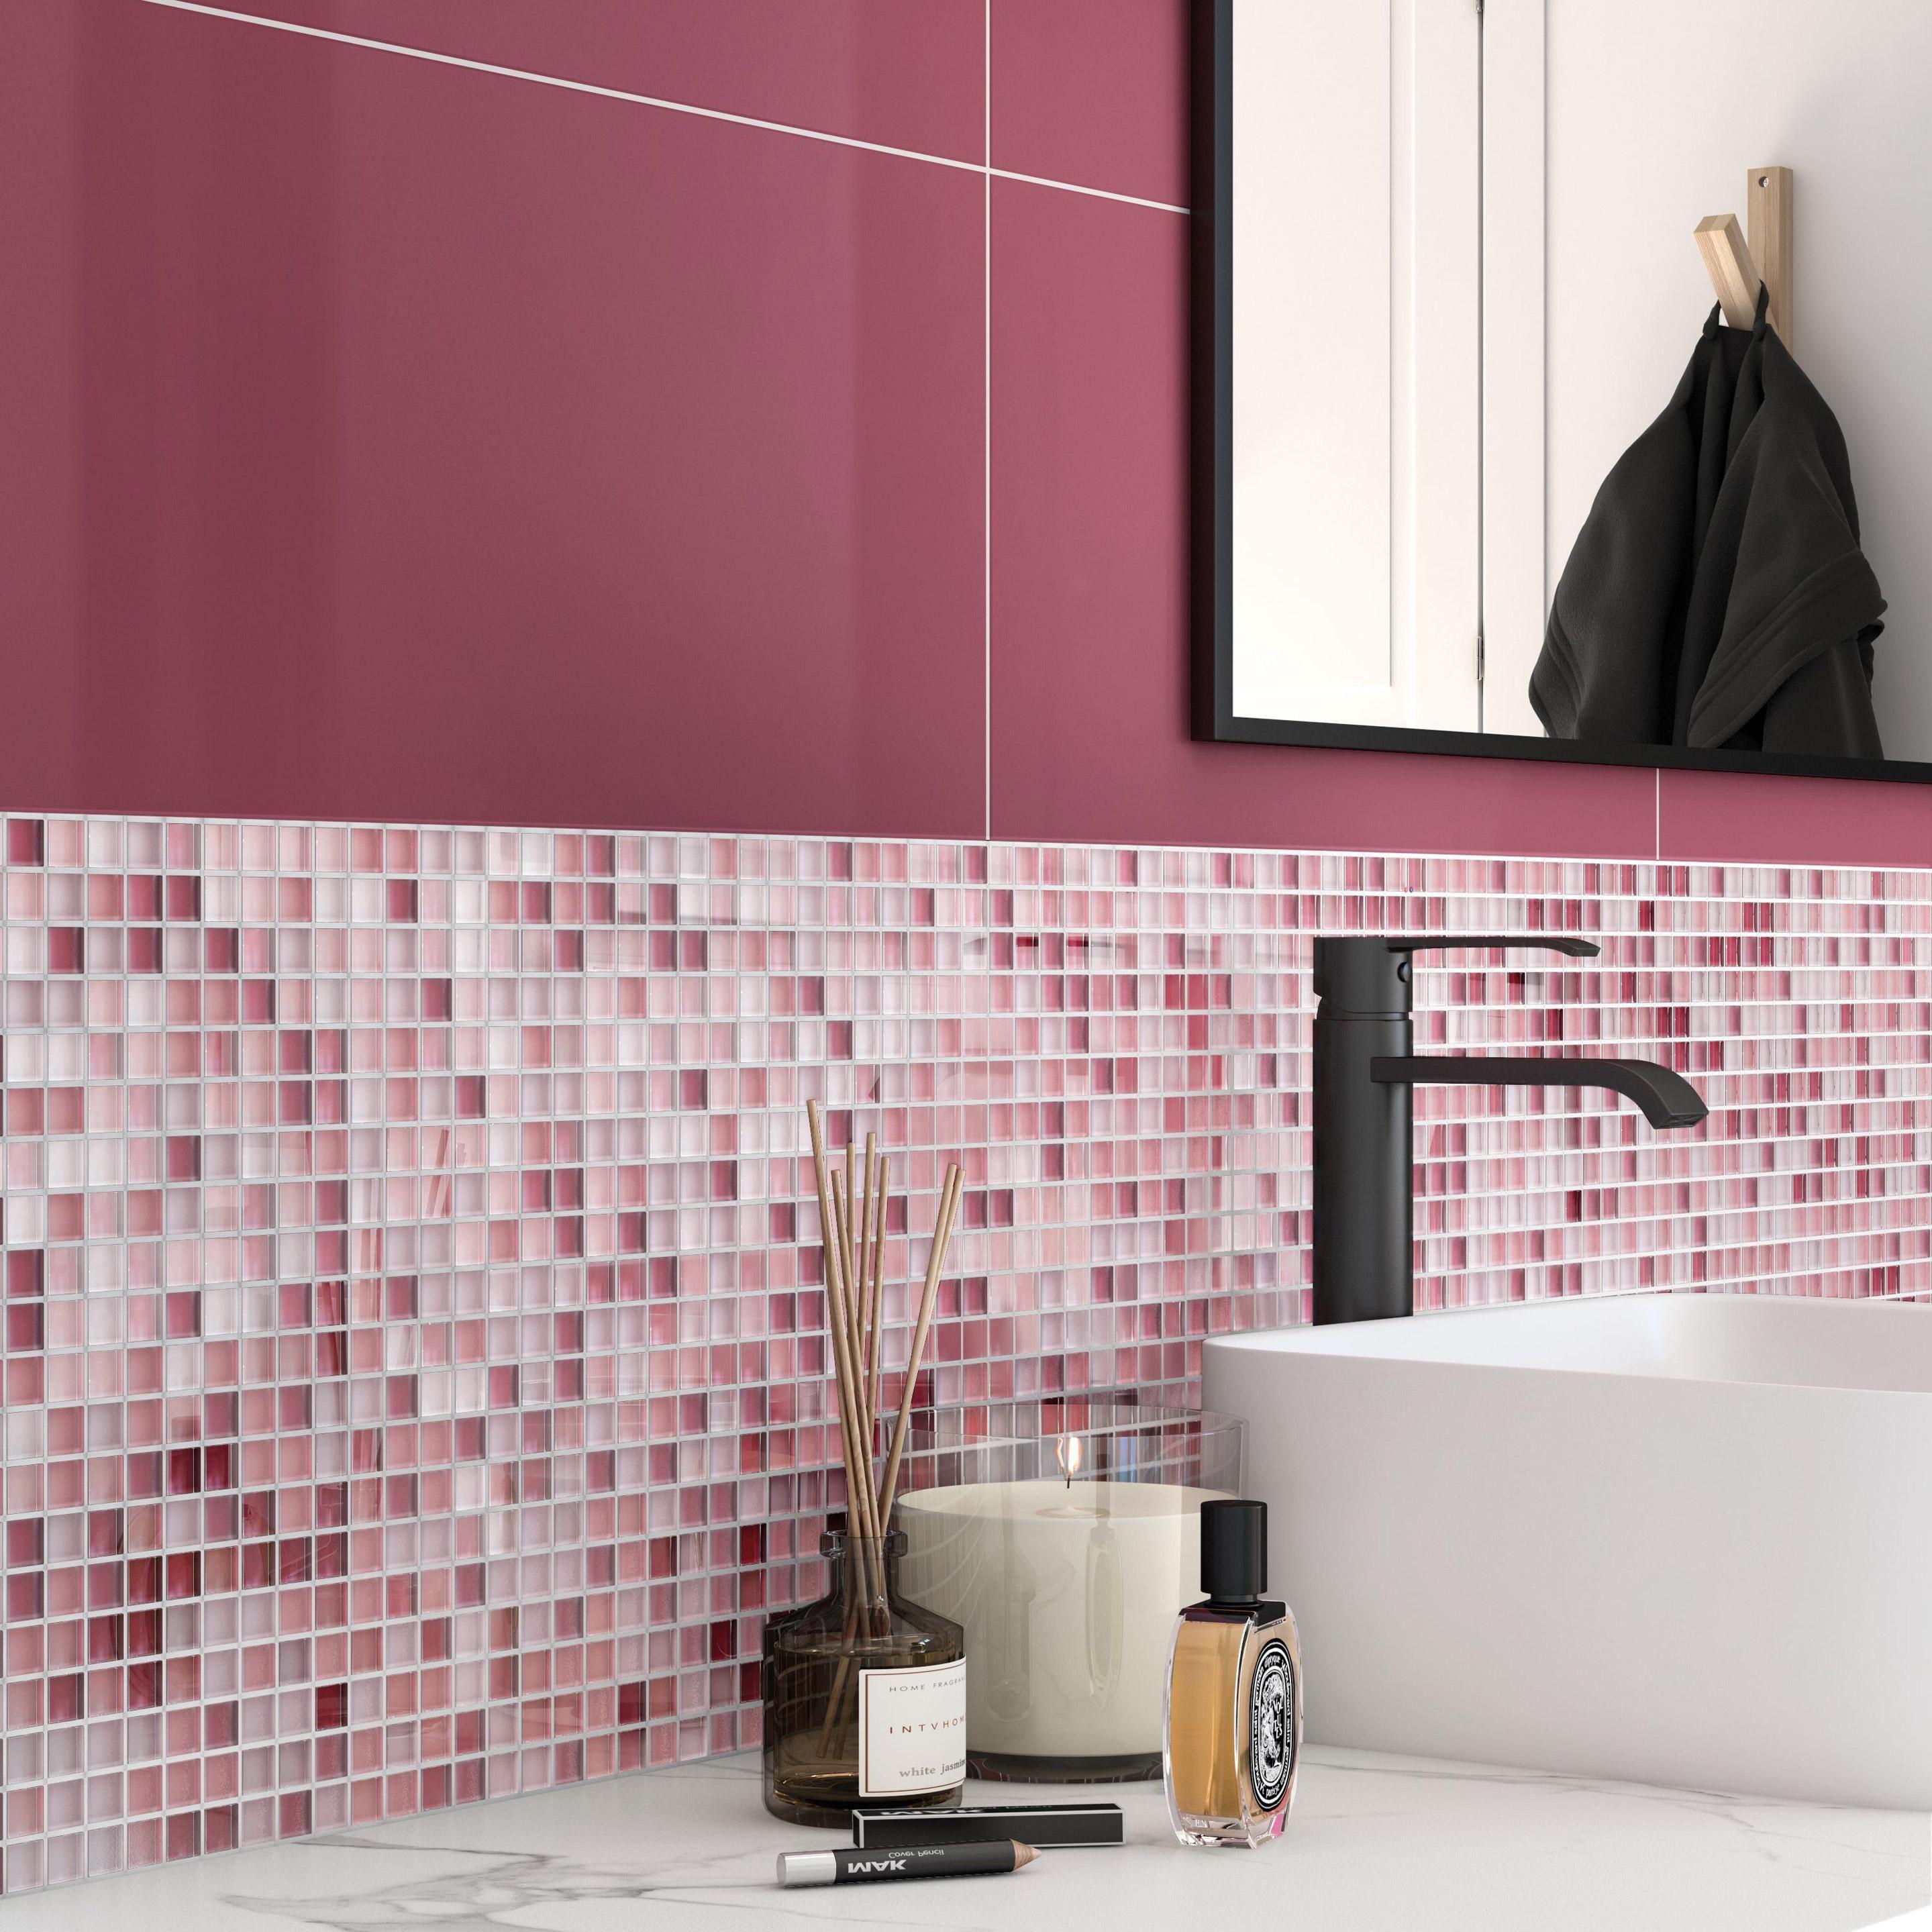 Carrelage Mur Prune Brillante L 25 X L 50 Cm Tonic Artens Murs